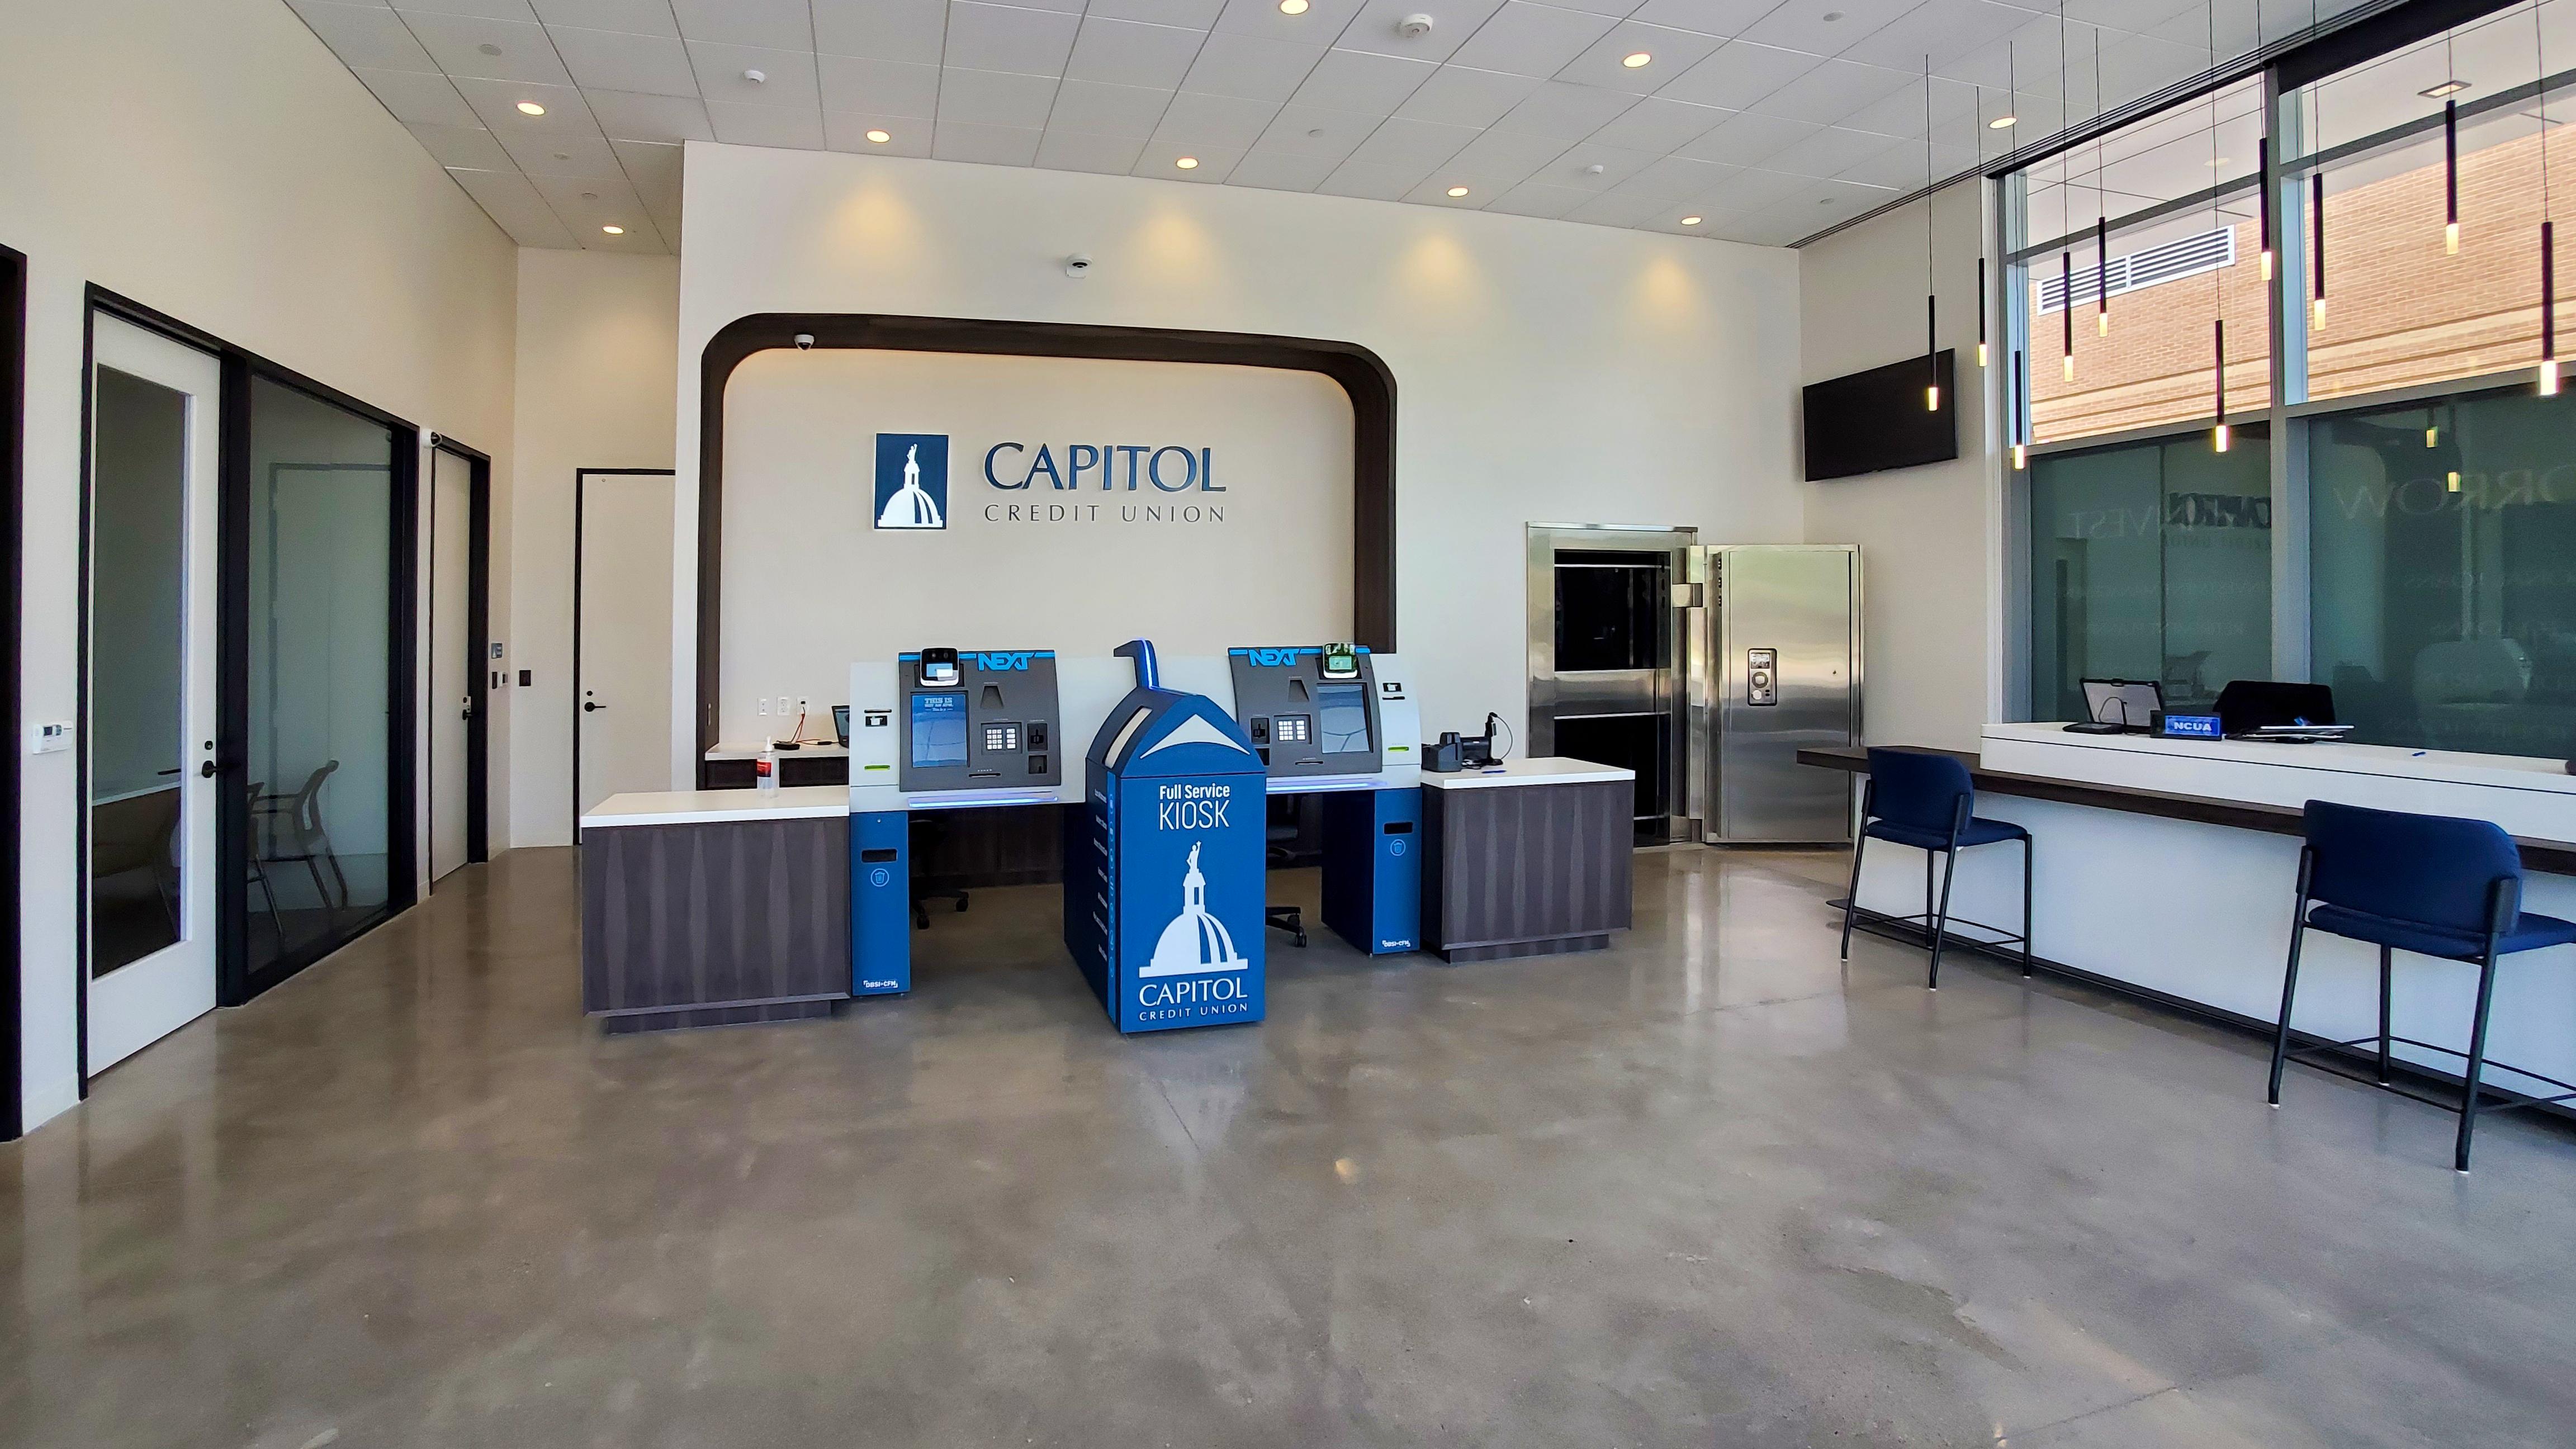 Capitol Credit Union High-Tech Branch